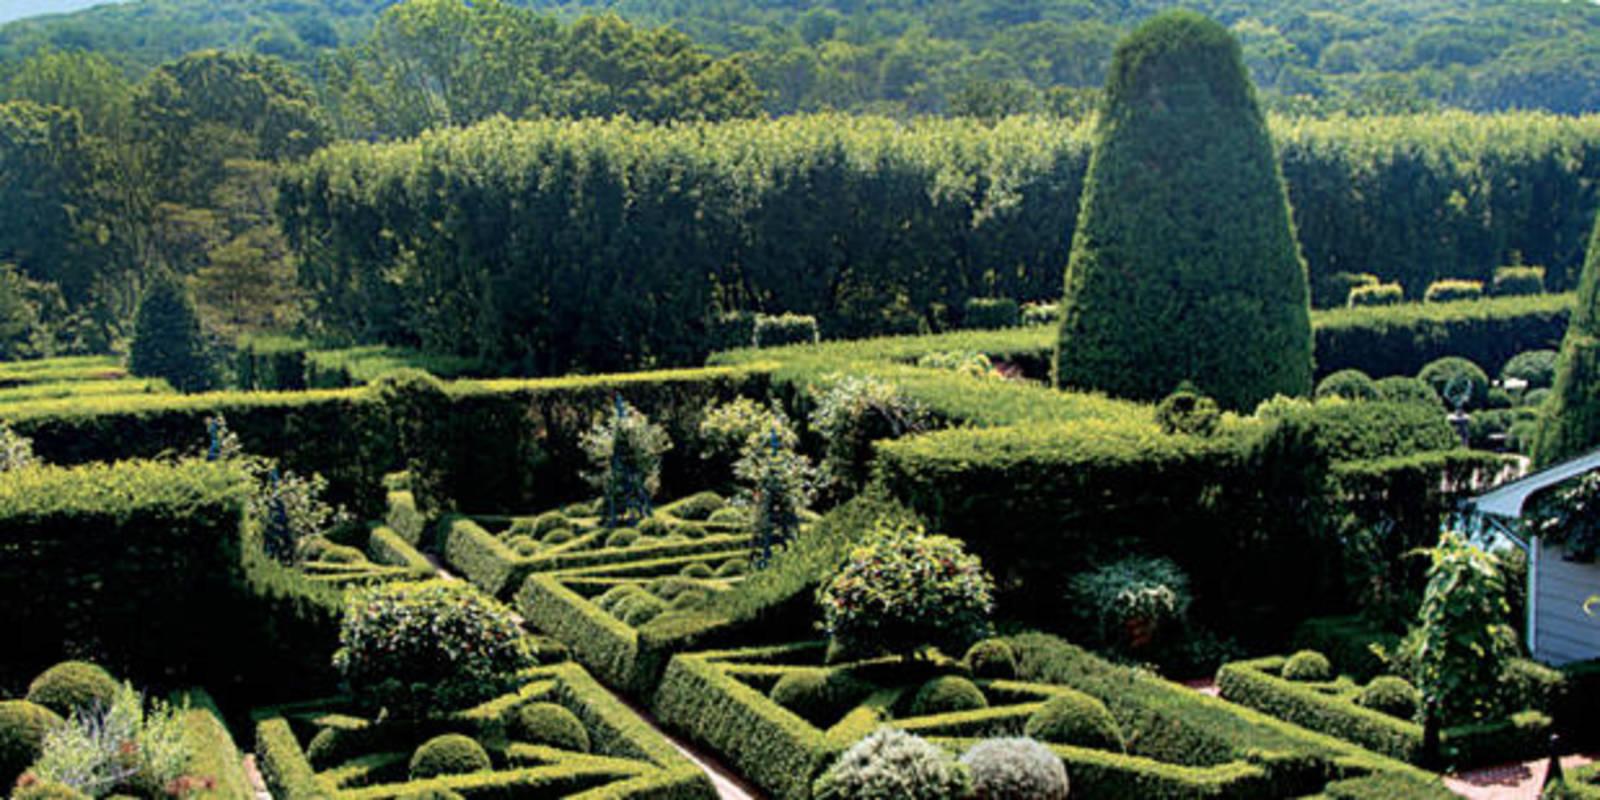 Oscar Renta Garden Impeccably Manicured La De